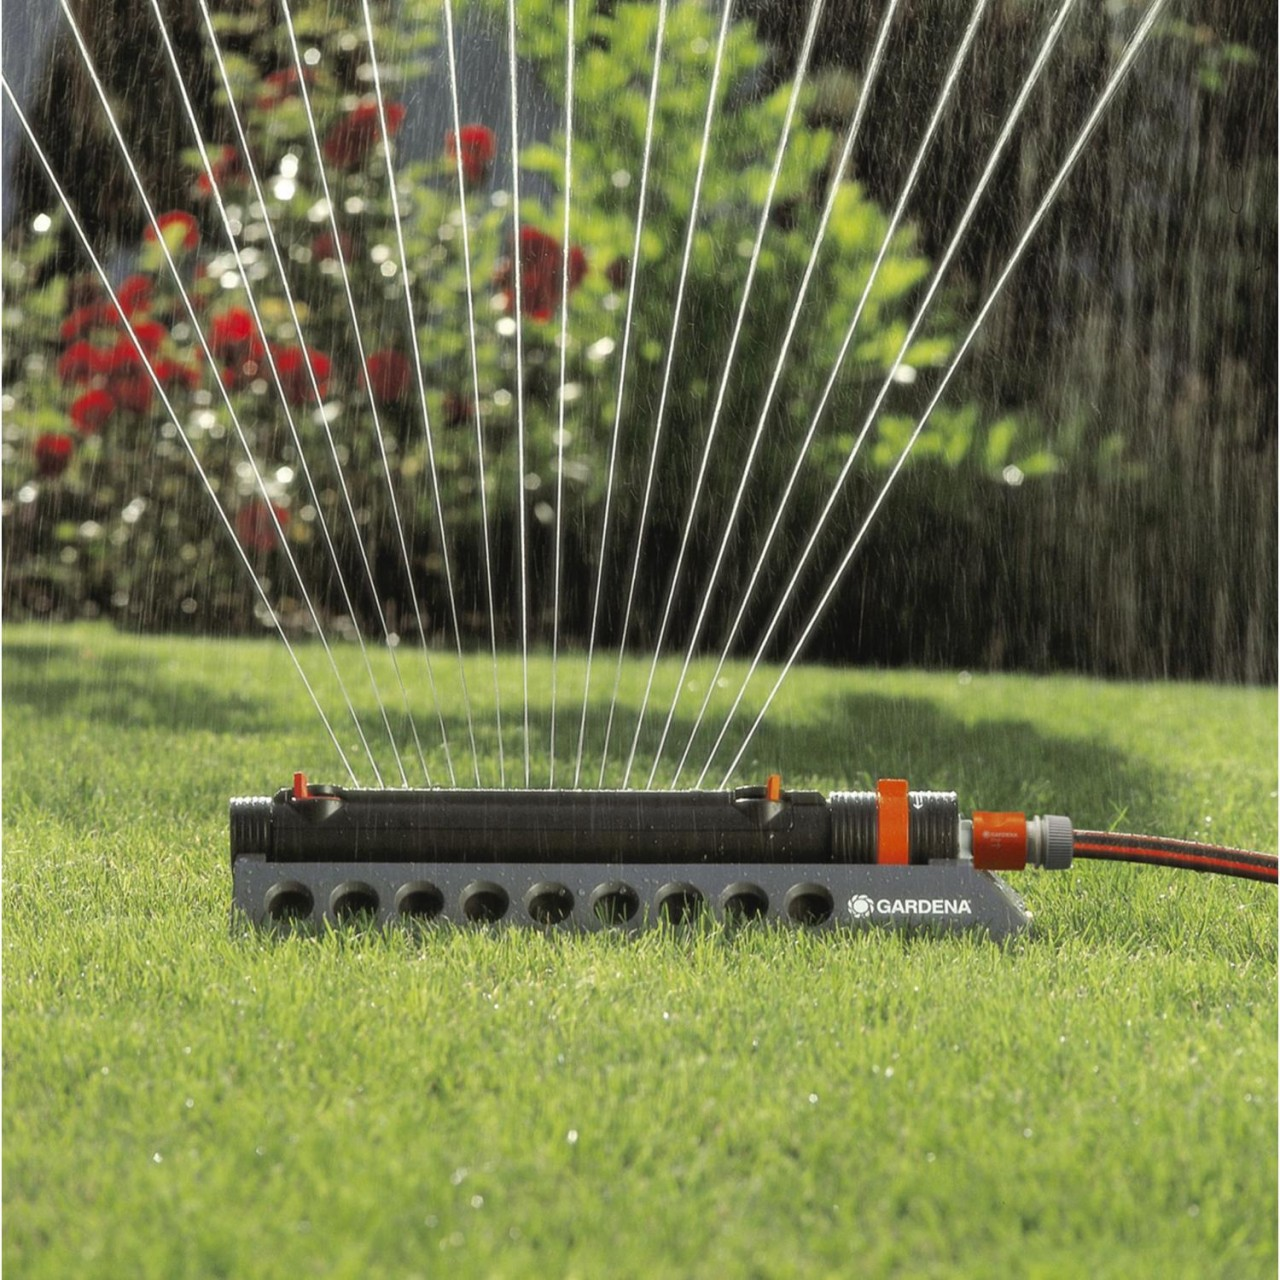 Gardena Comfort Aquazoom 250/2 1973-20 Viereckregner Bewässerung Garten Sprenger